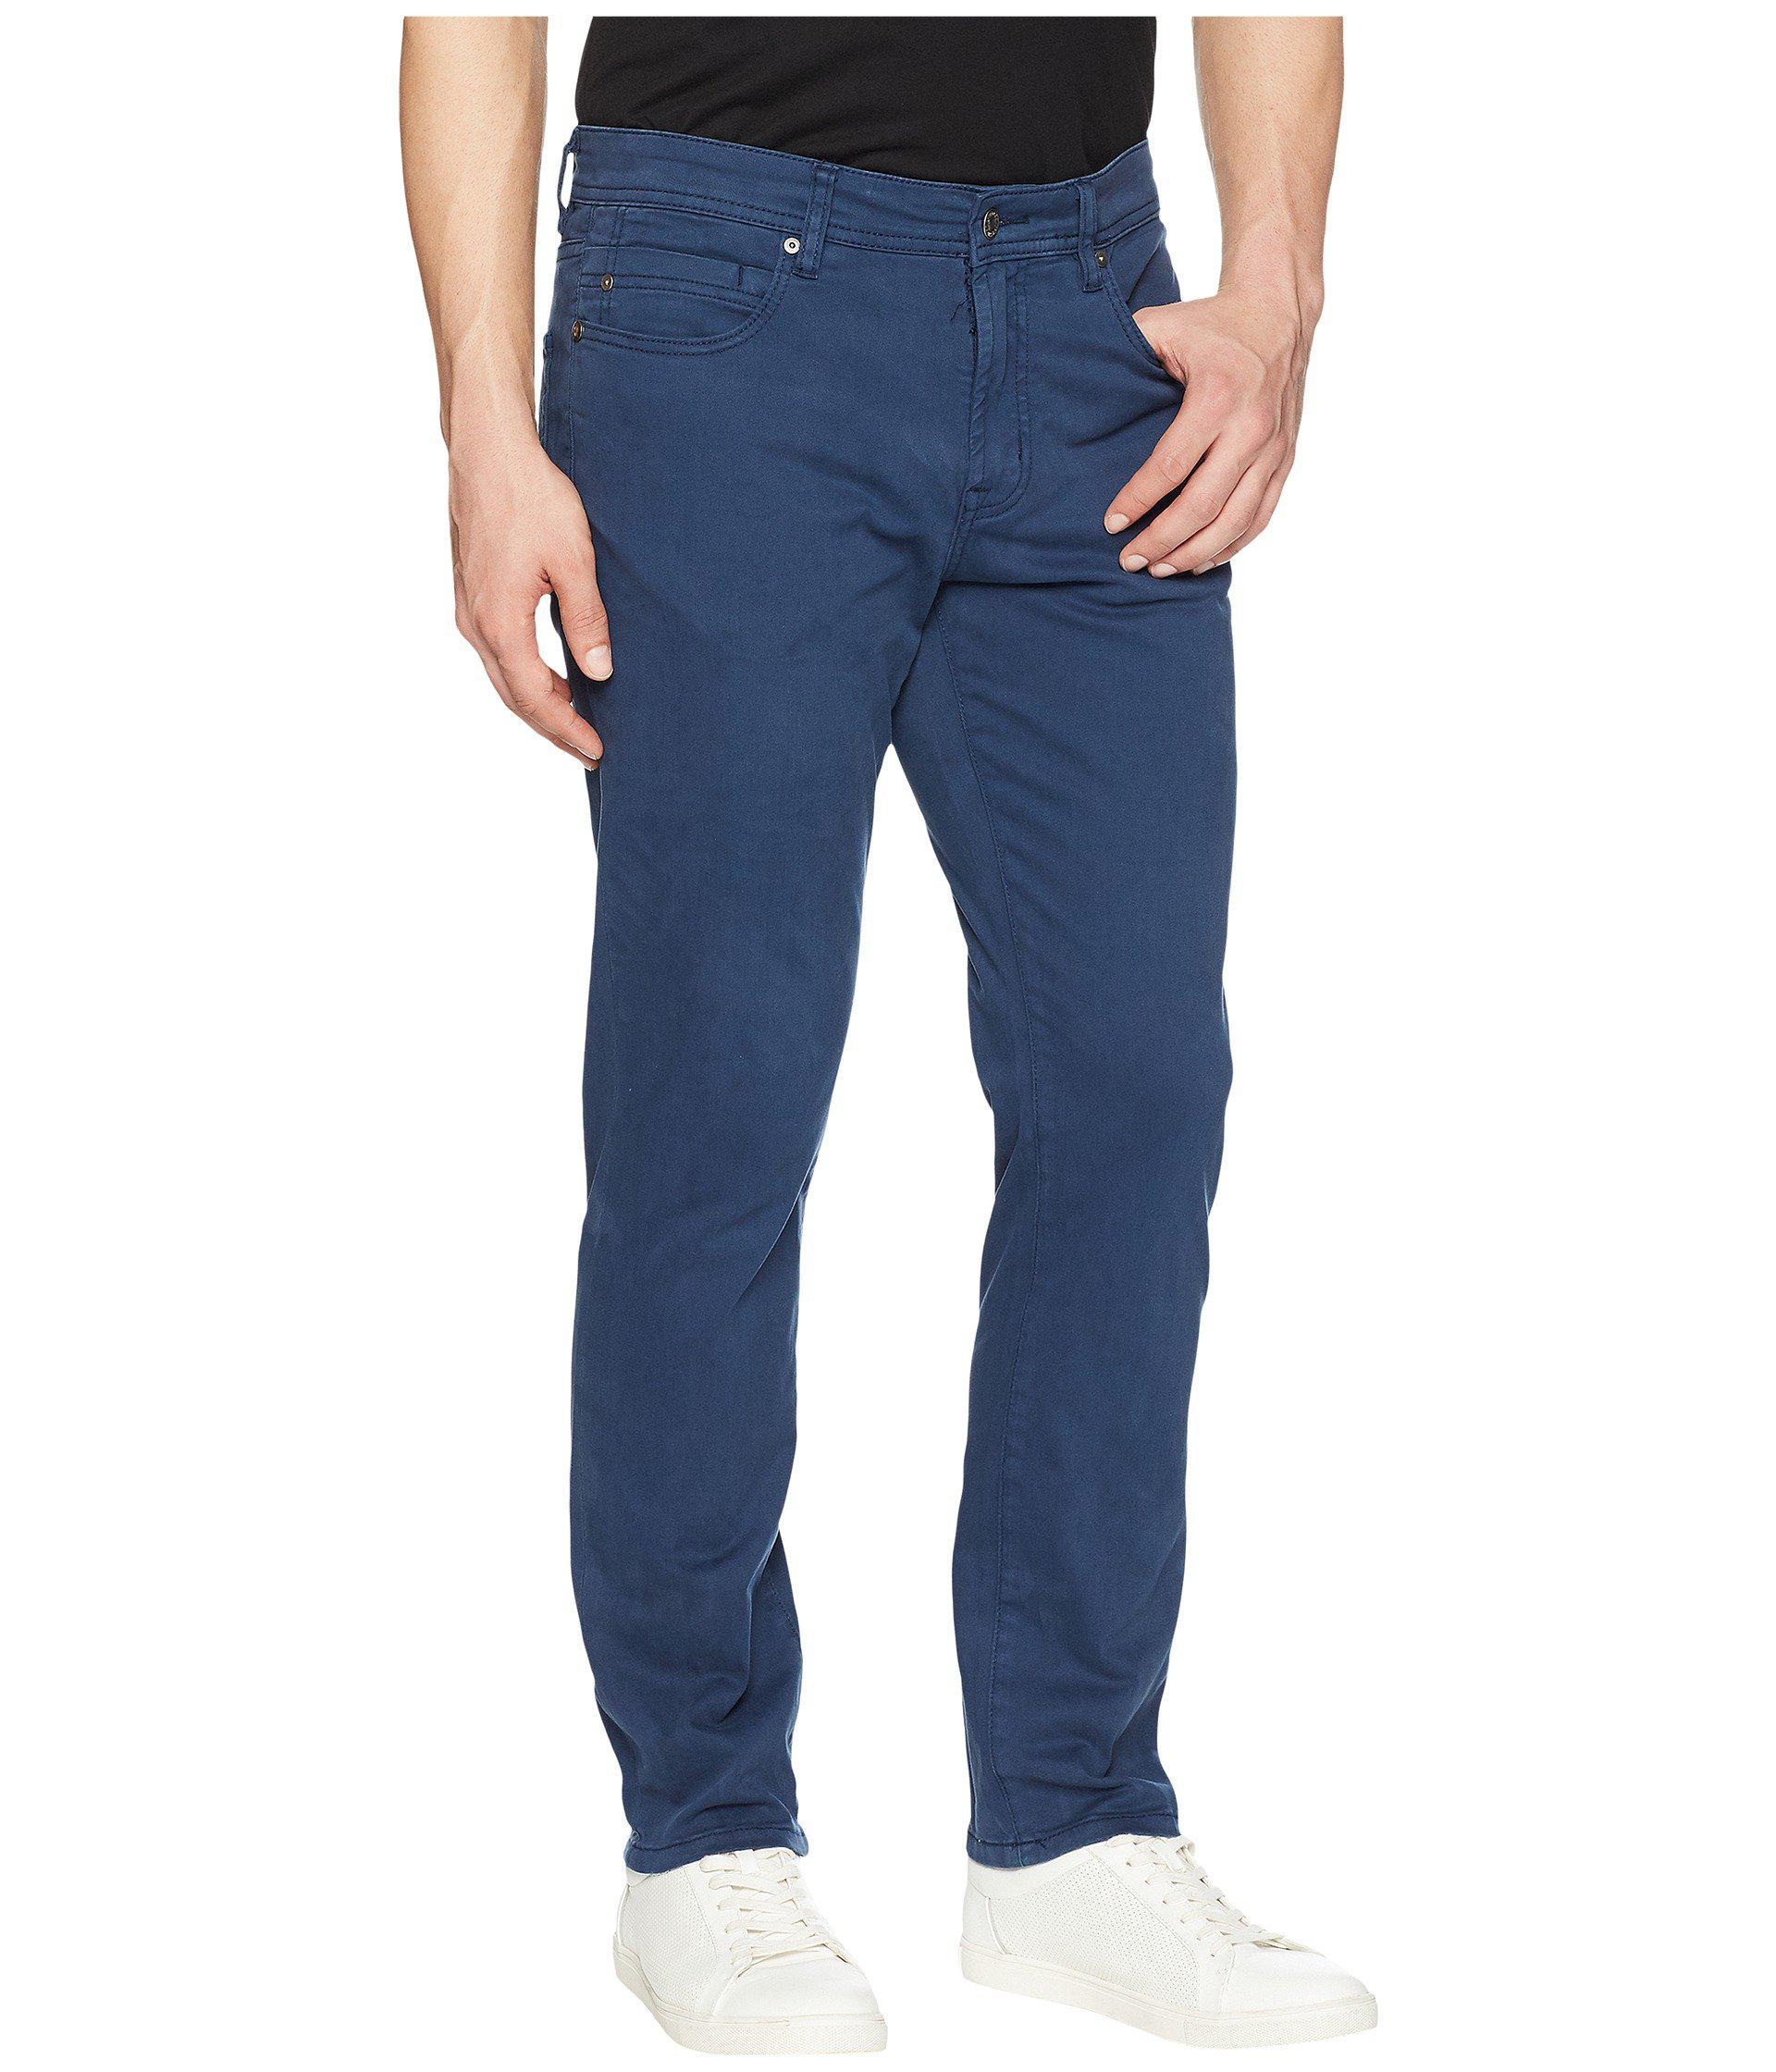 women comforter skinny denim sku pullon pull p grey nora in jeans waist comfort thunder c cygztzp on petite